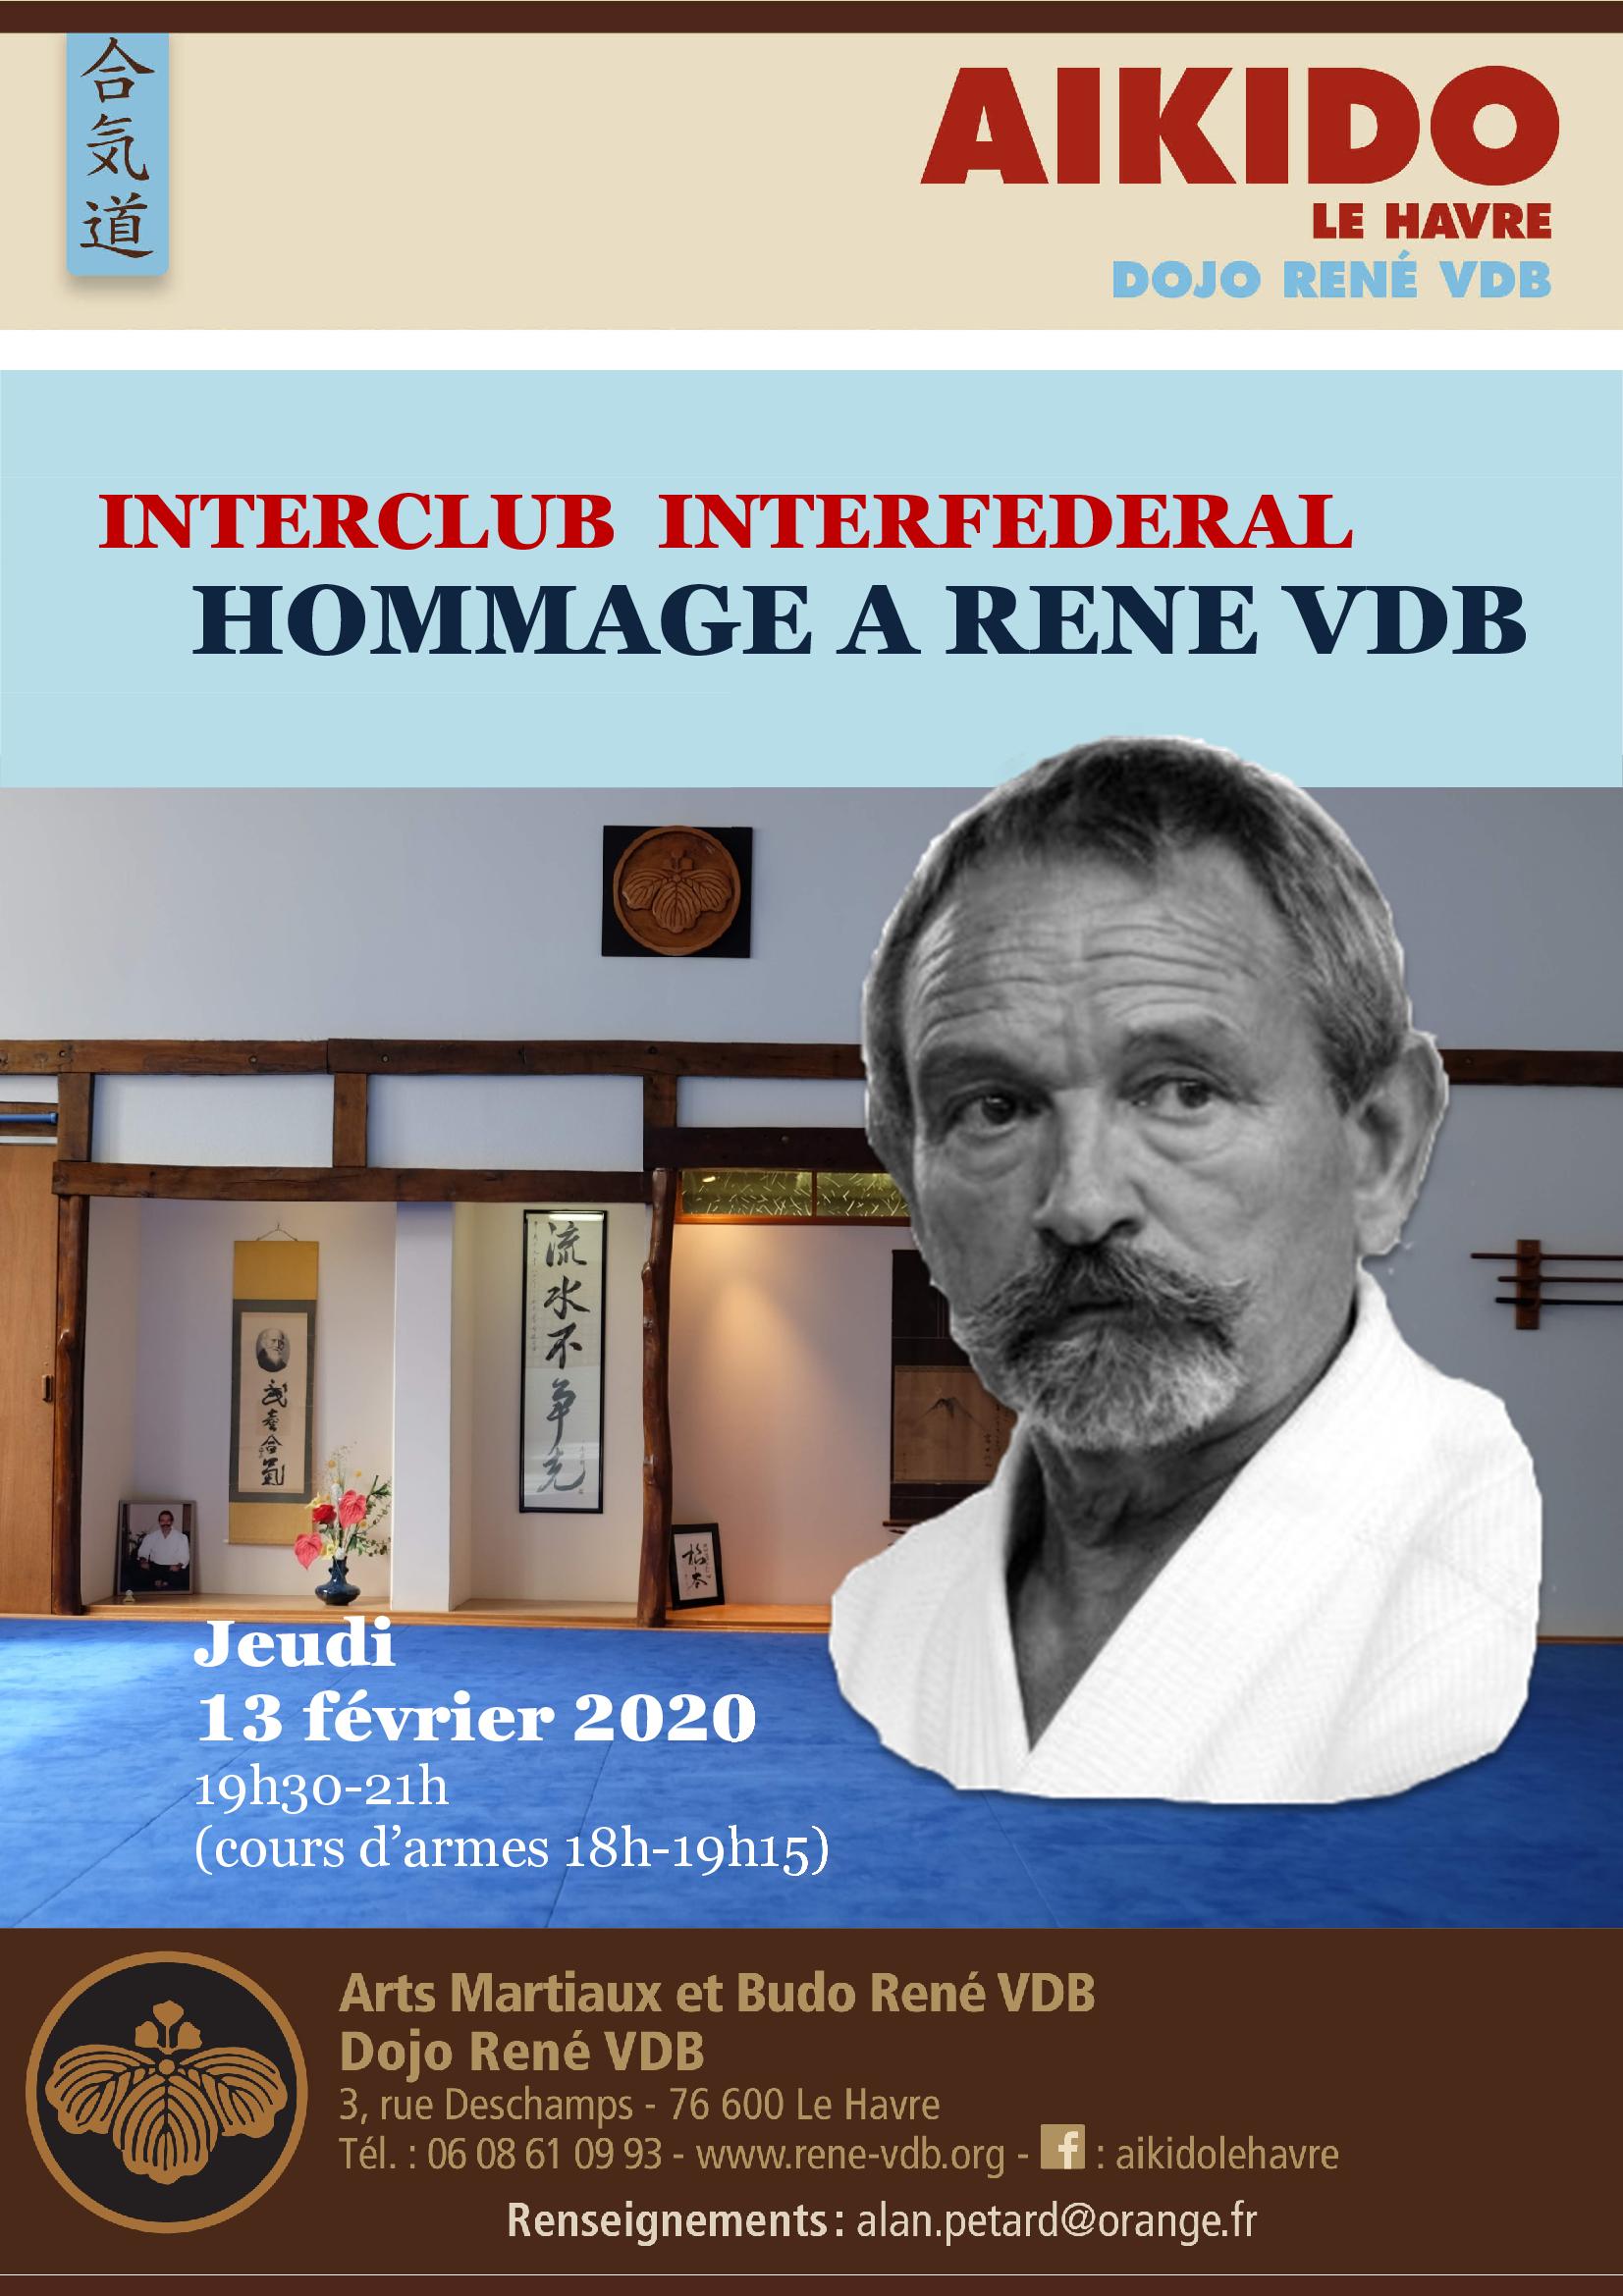 Interclub avec la FFAB le 13 Fév 2020